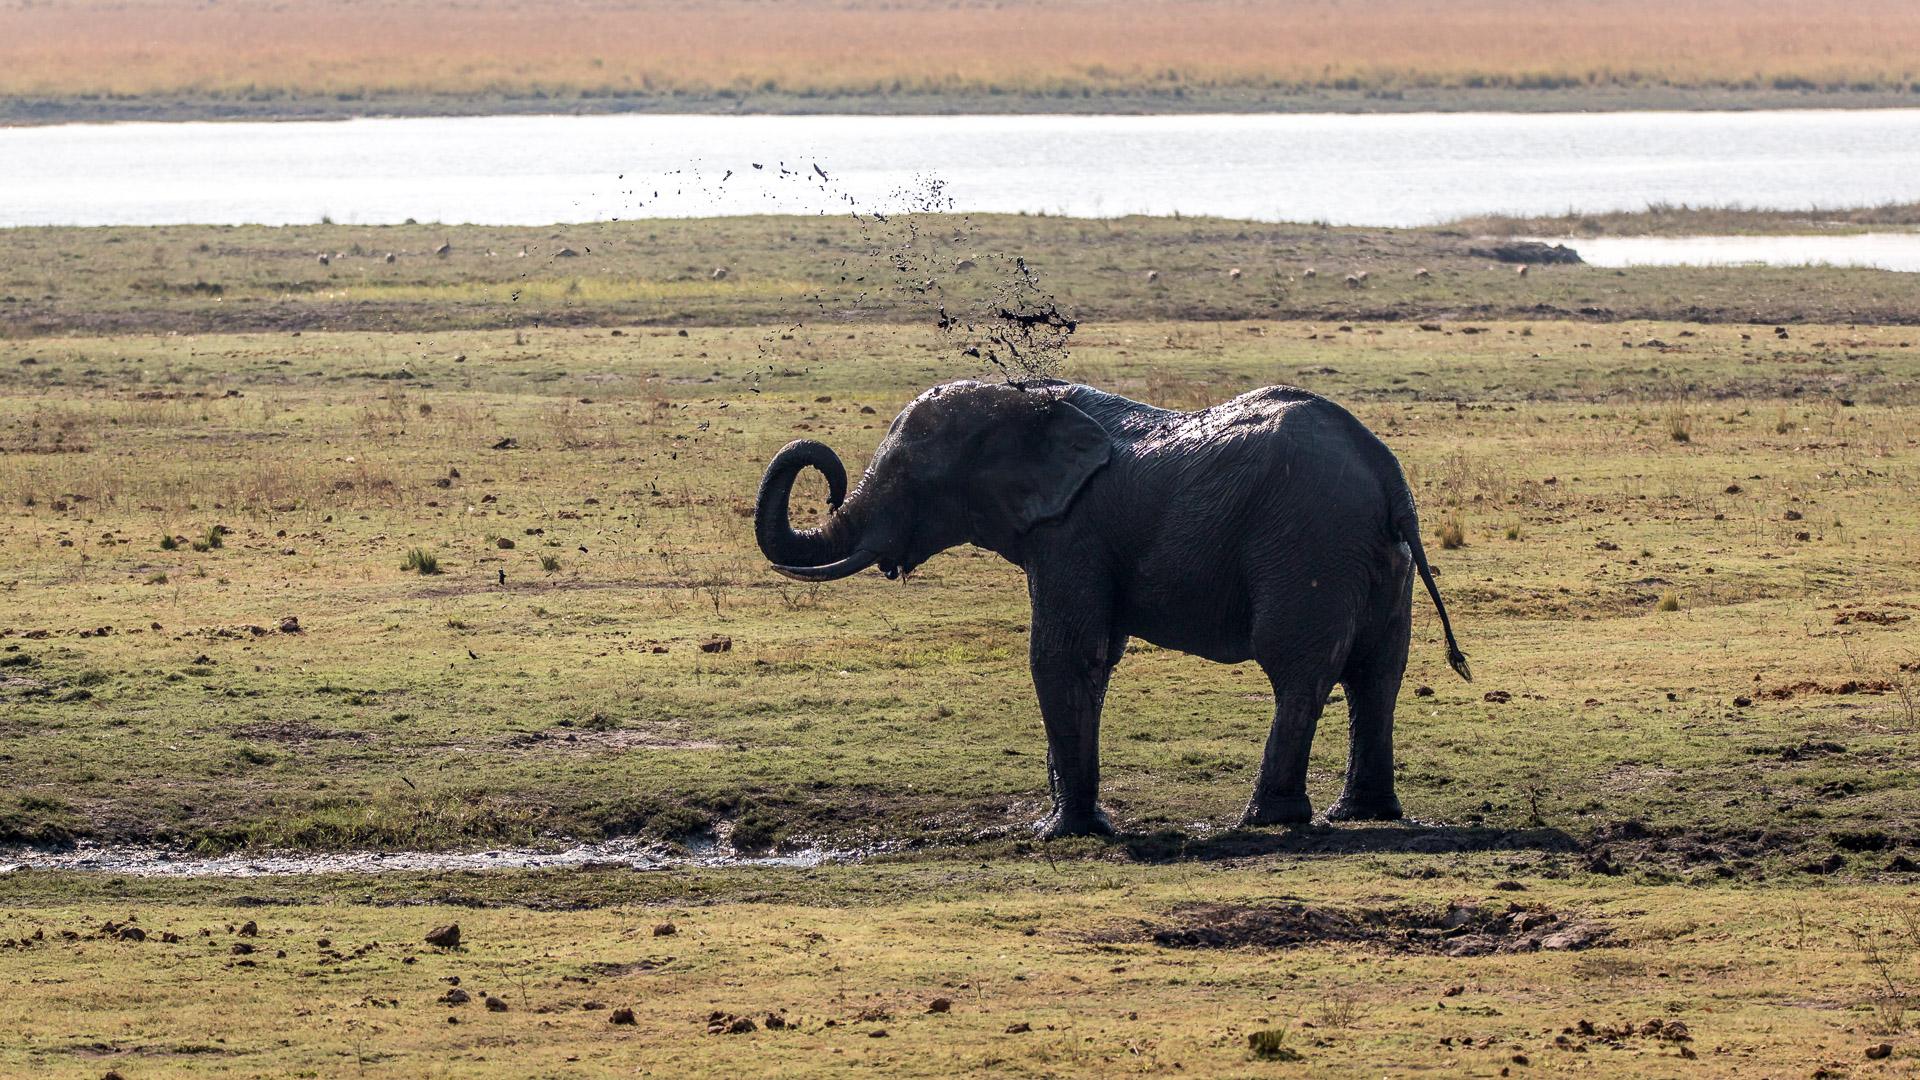 17./18.7. Chobe NP, River Drive nach Ihaha - Elefant